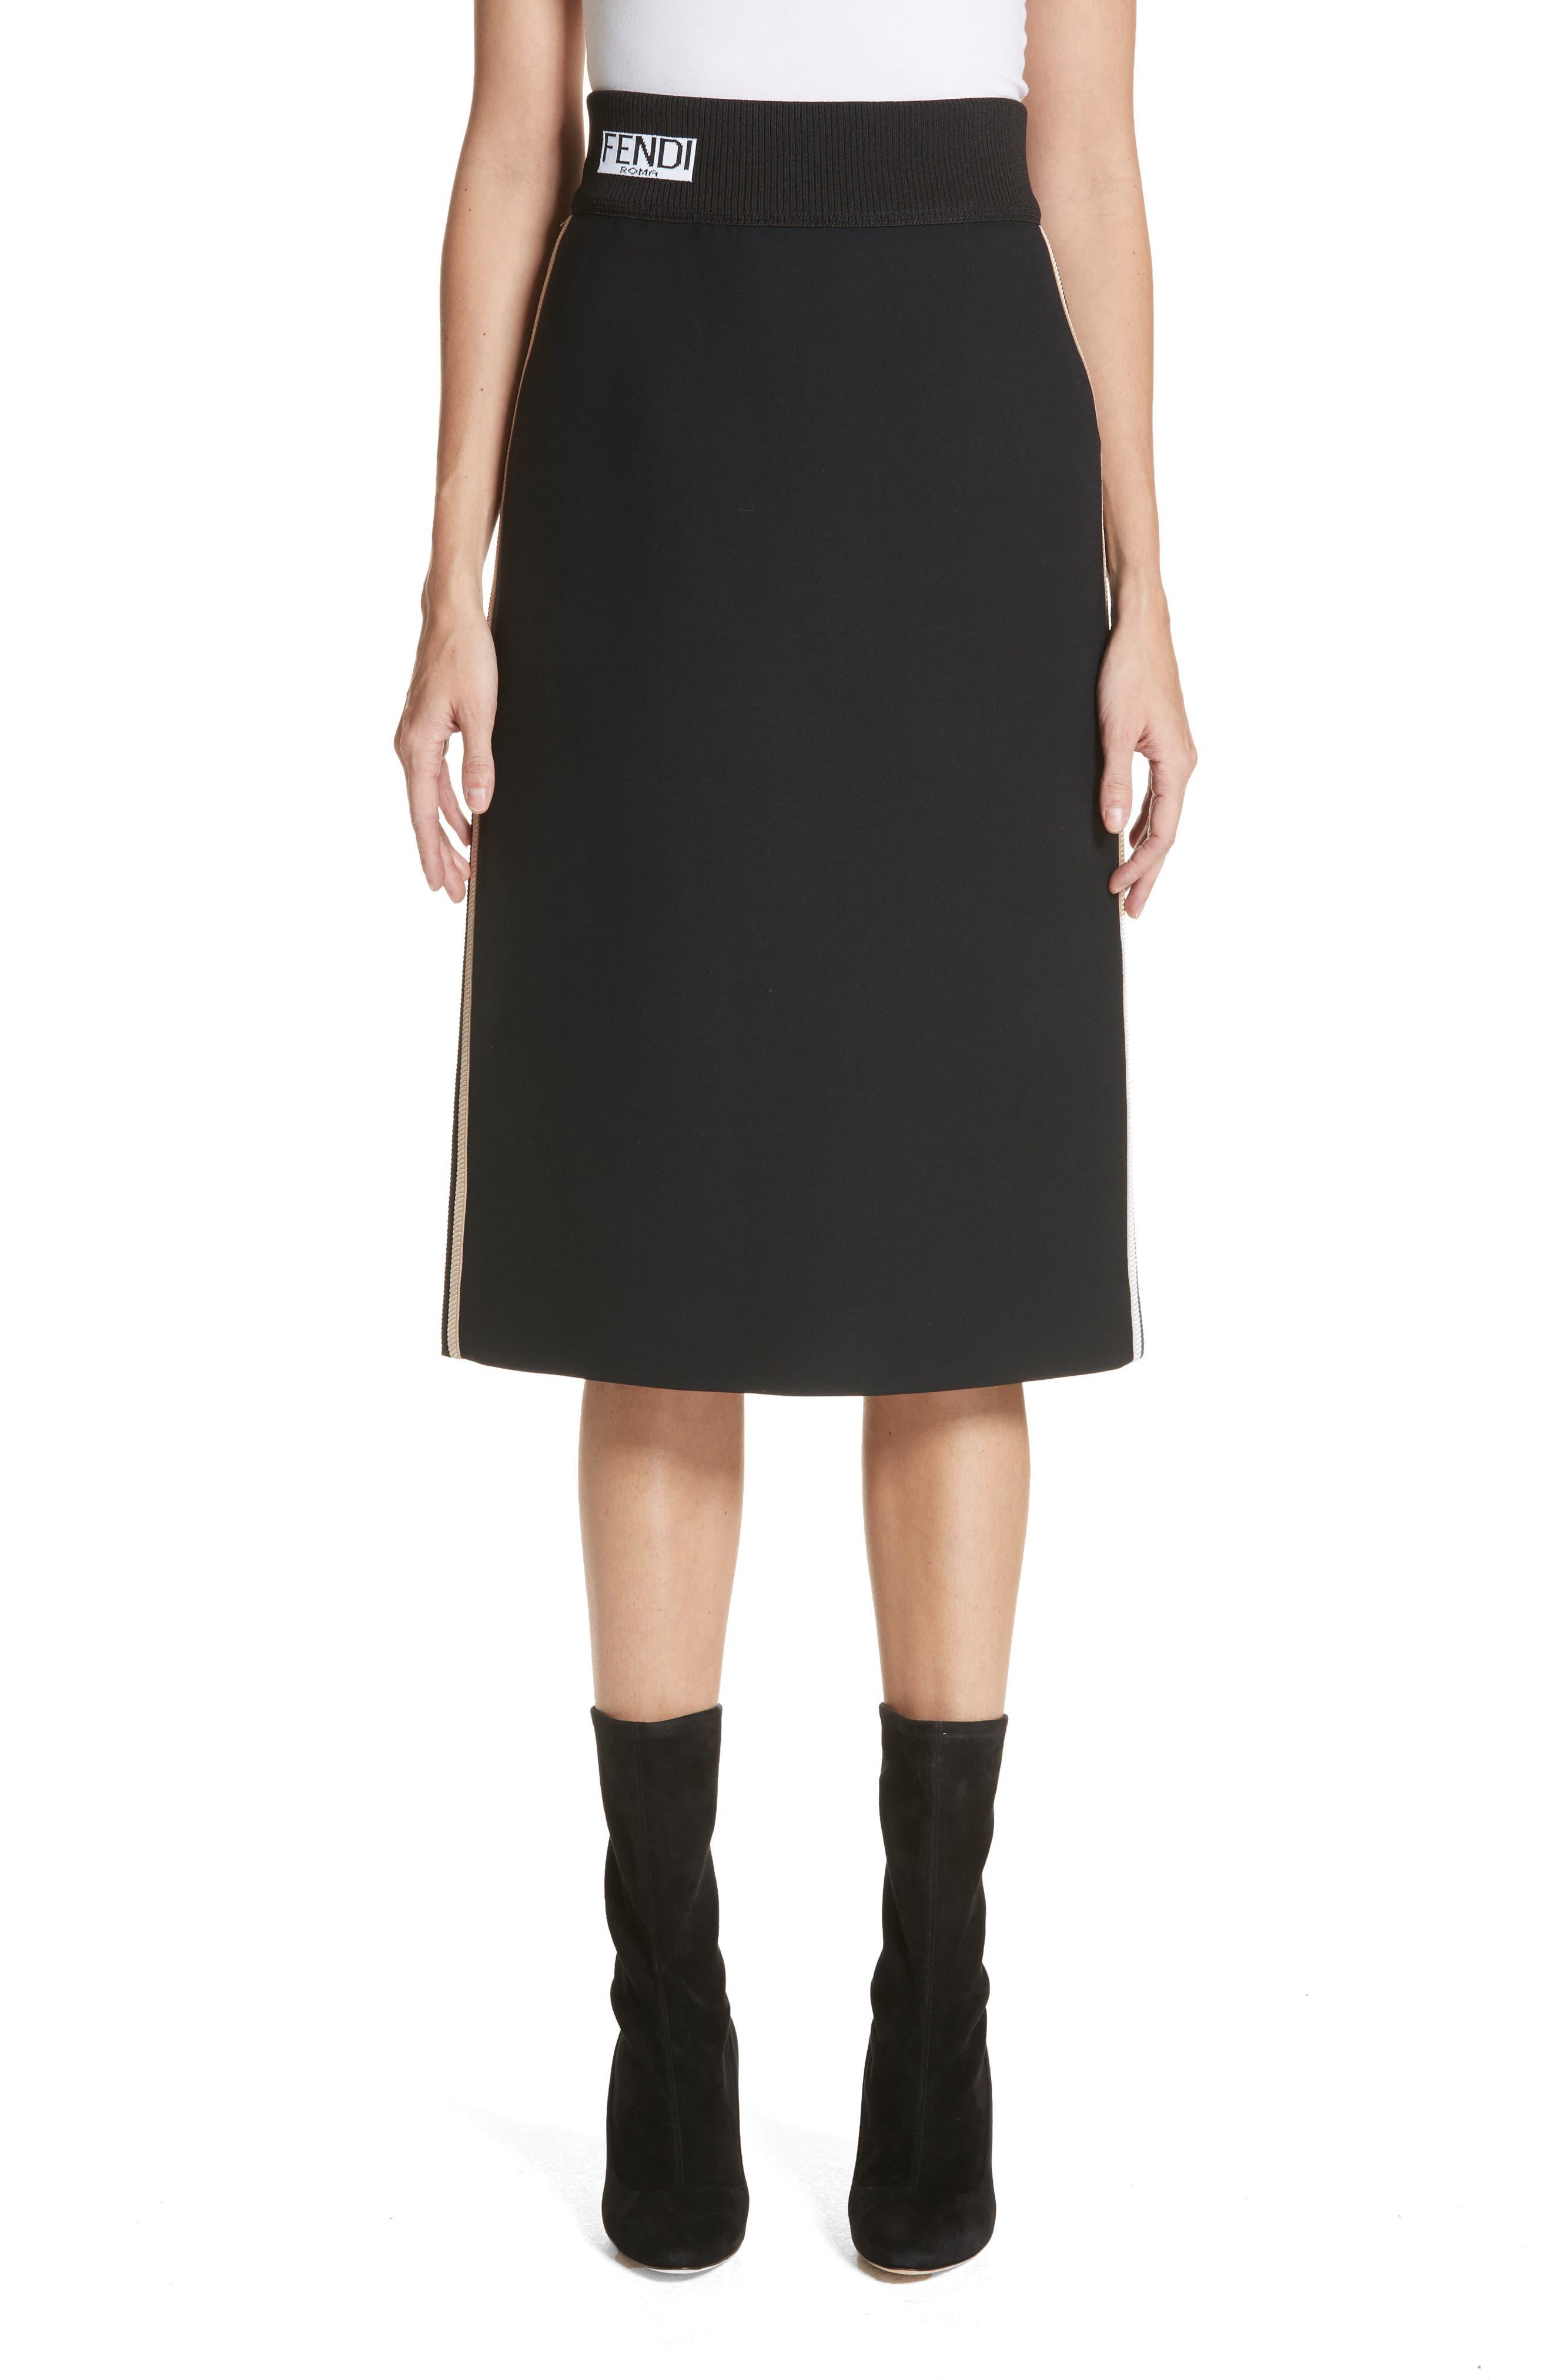 Alternate Image 1 Selected - Fendi Wool & Silk Gazar Pencil Skirt